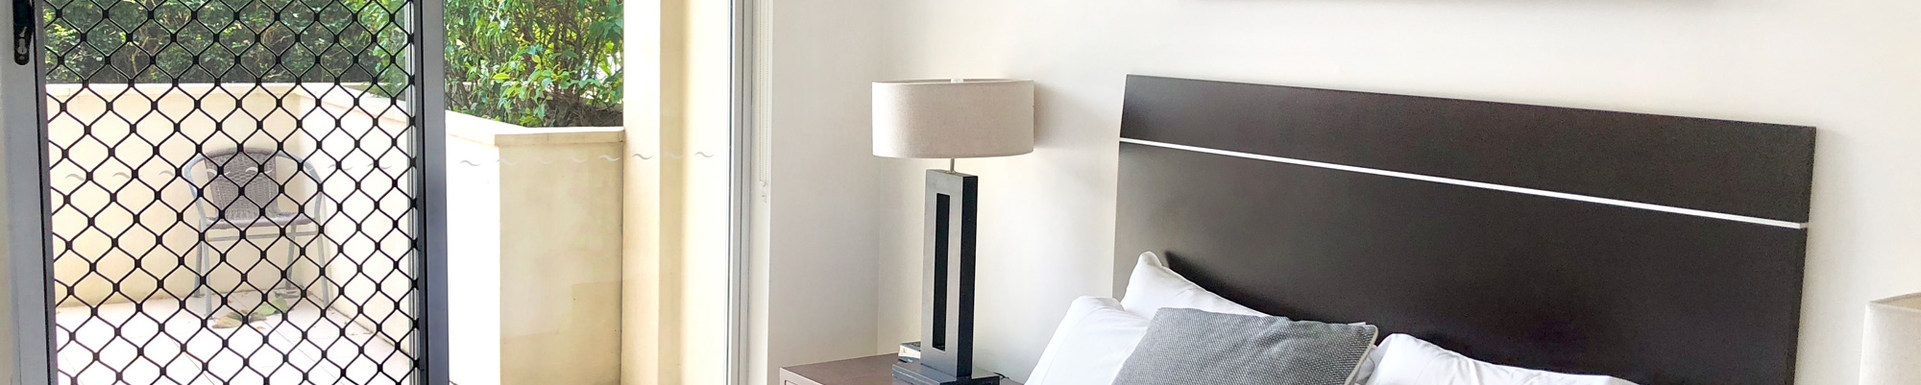 2 Bed Ground Floor Master Suite